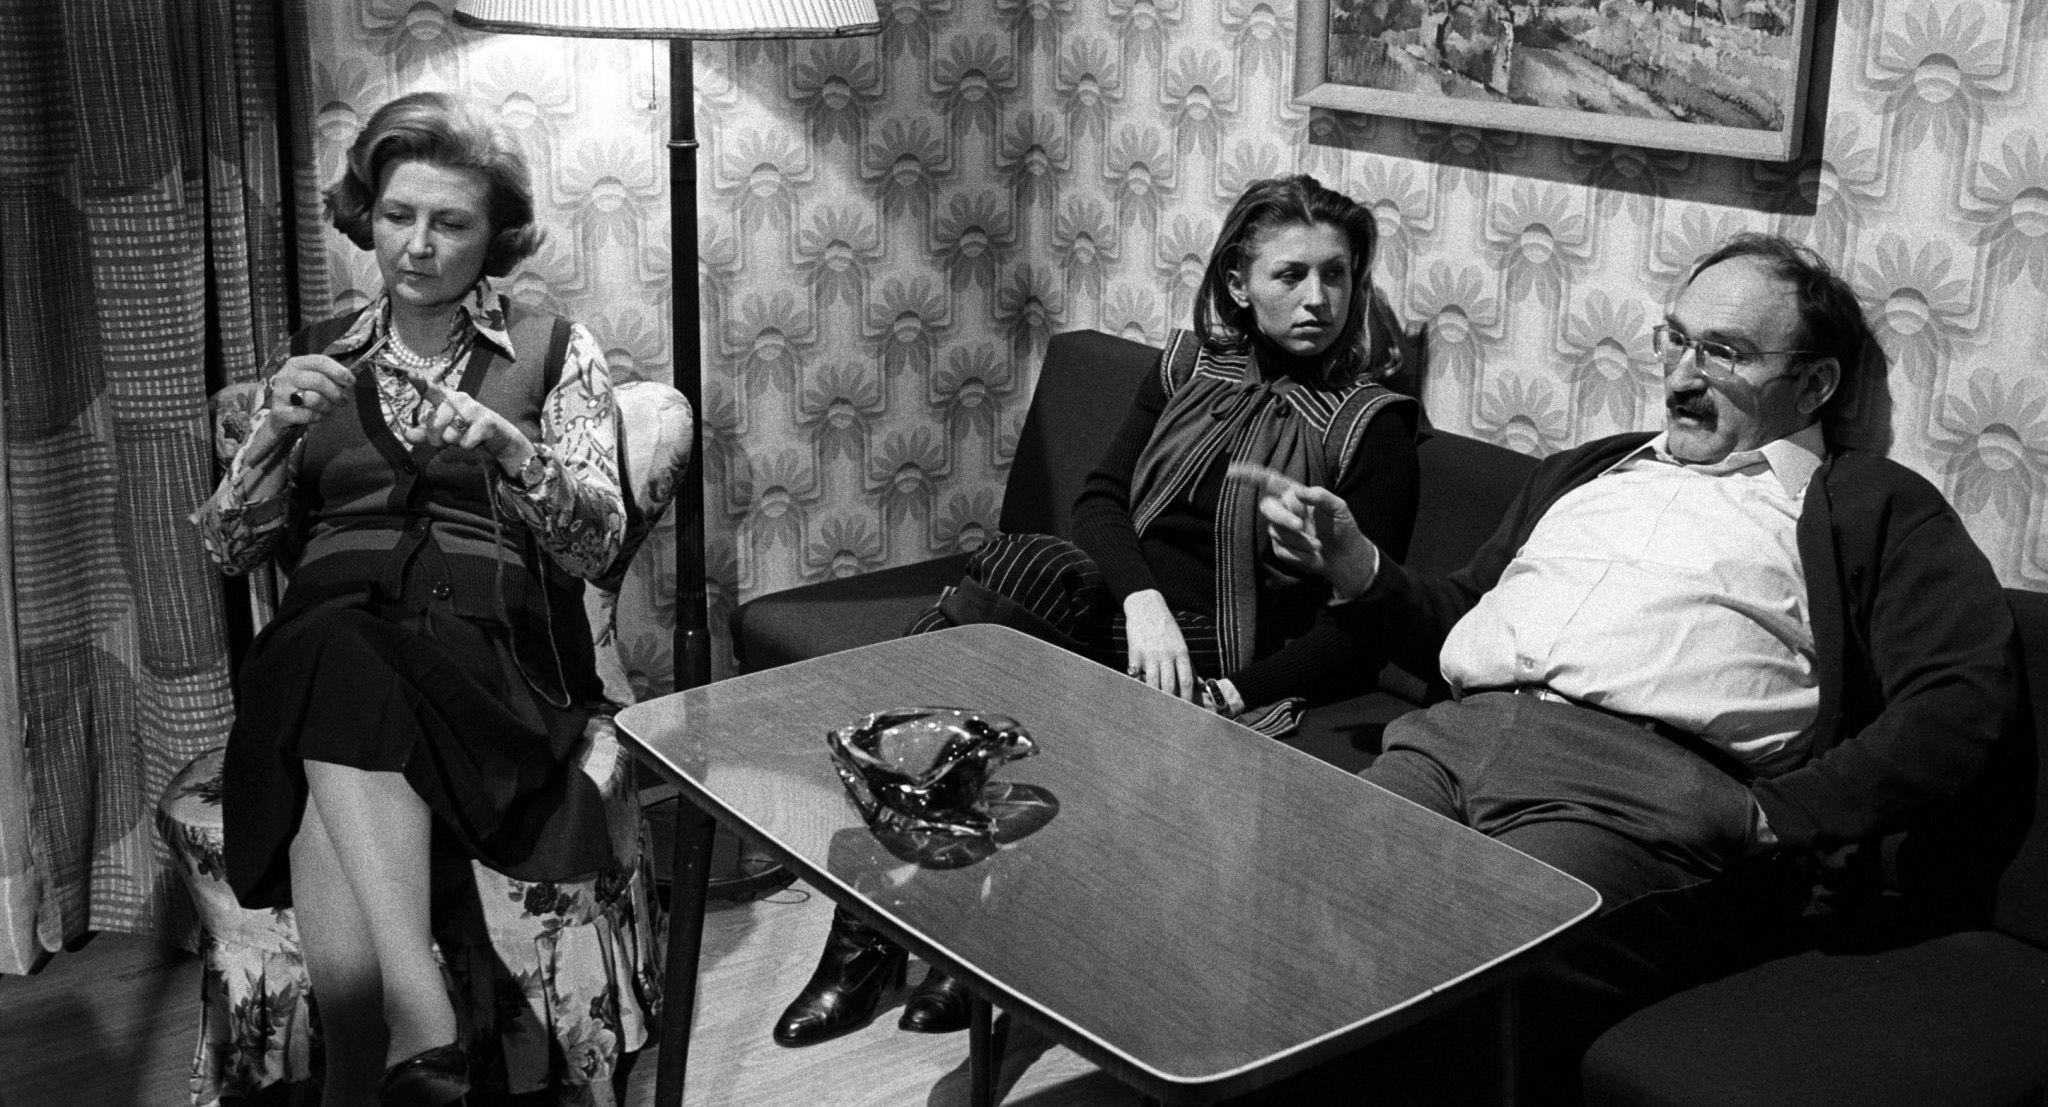 Martha Werner (Ilse Hanel), Irmi (Liliana Nelska), Herr Werner (Jaromir Borek)